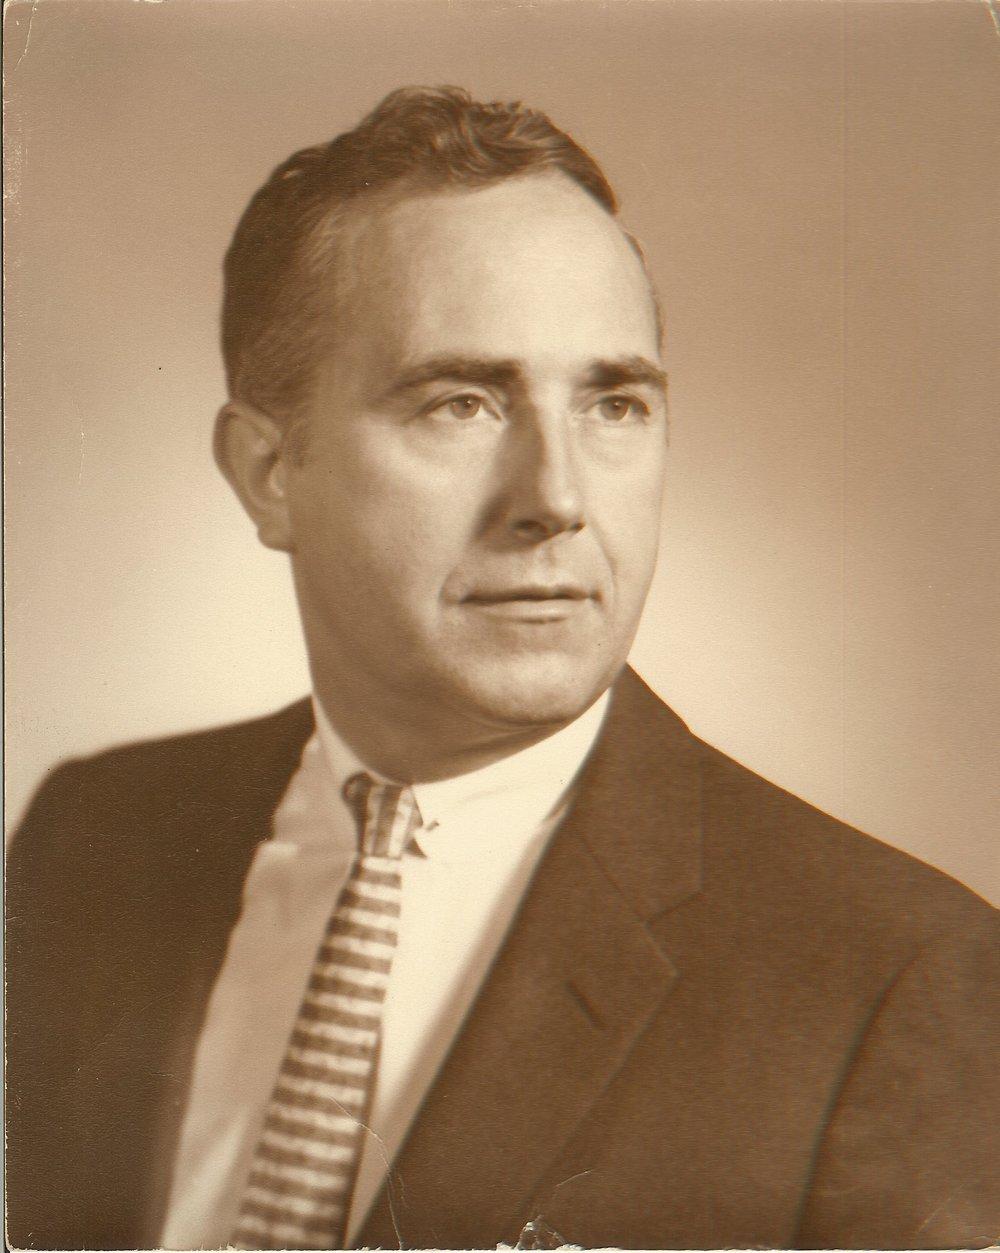 Rev. Melvin O. Smith, Pastor 1970-2004